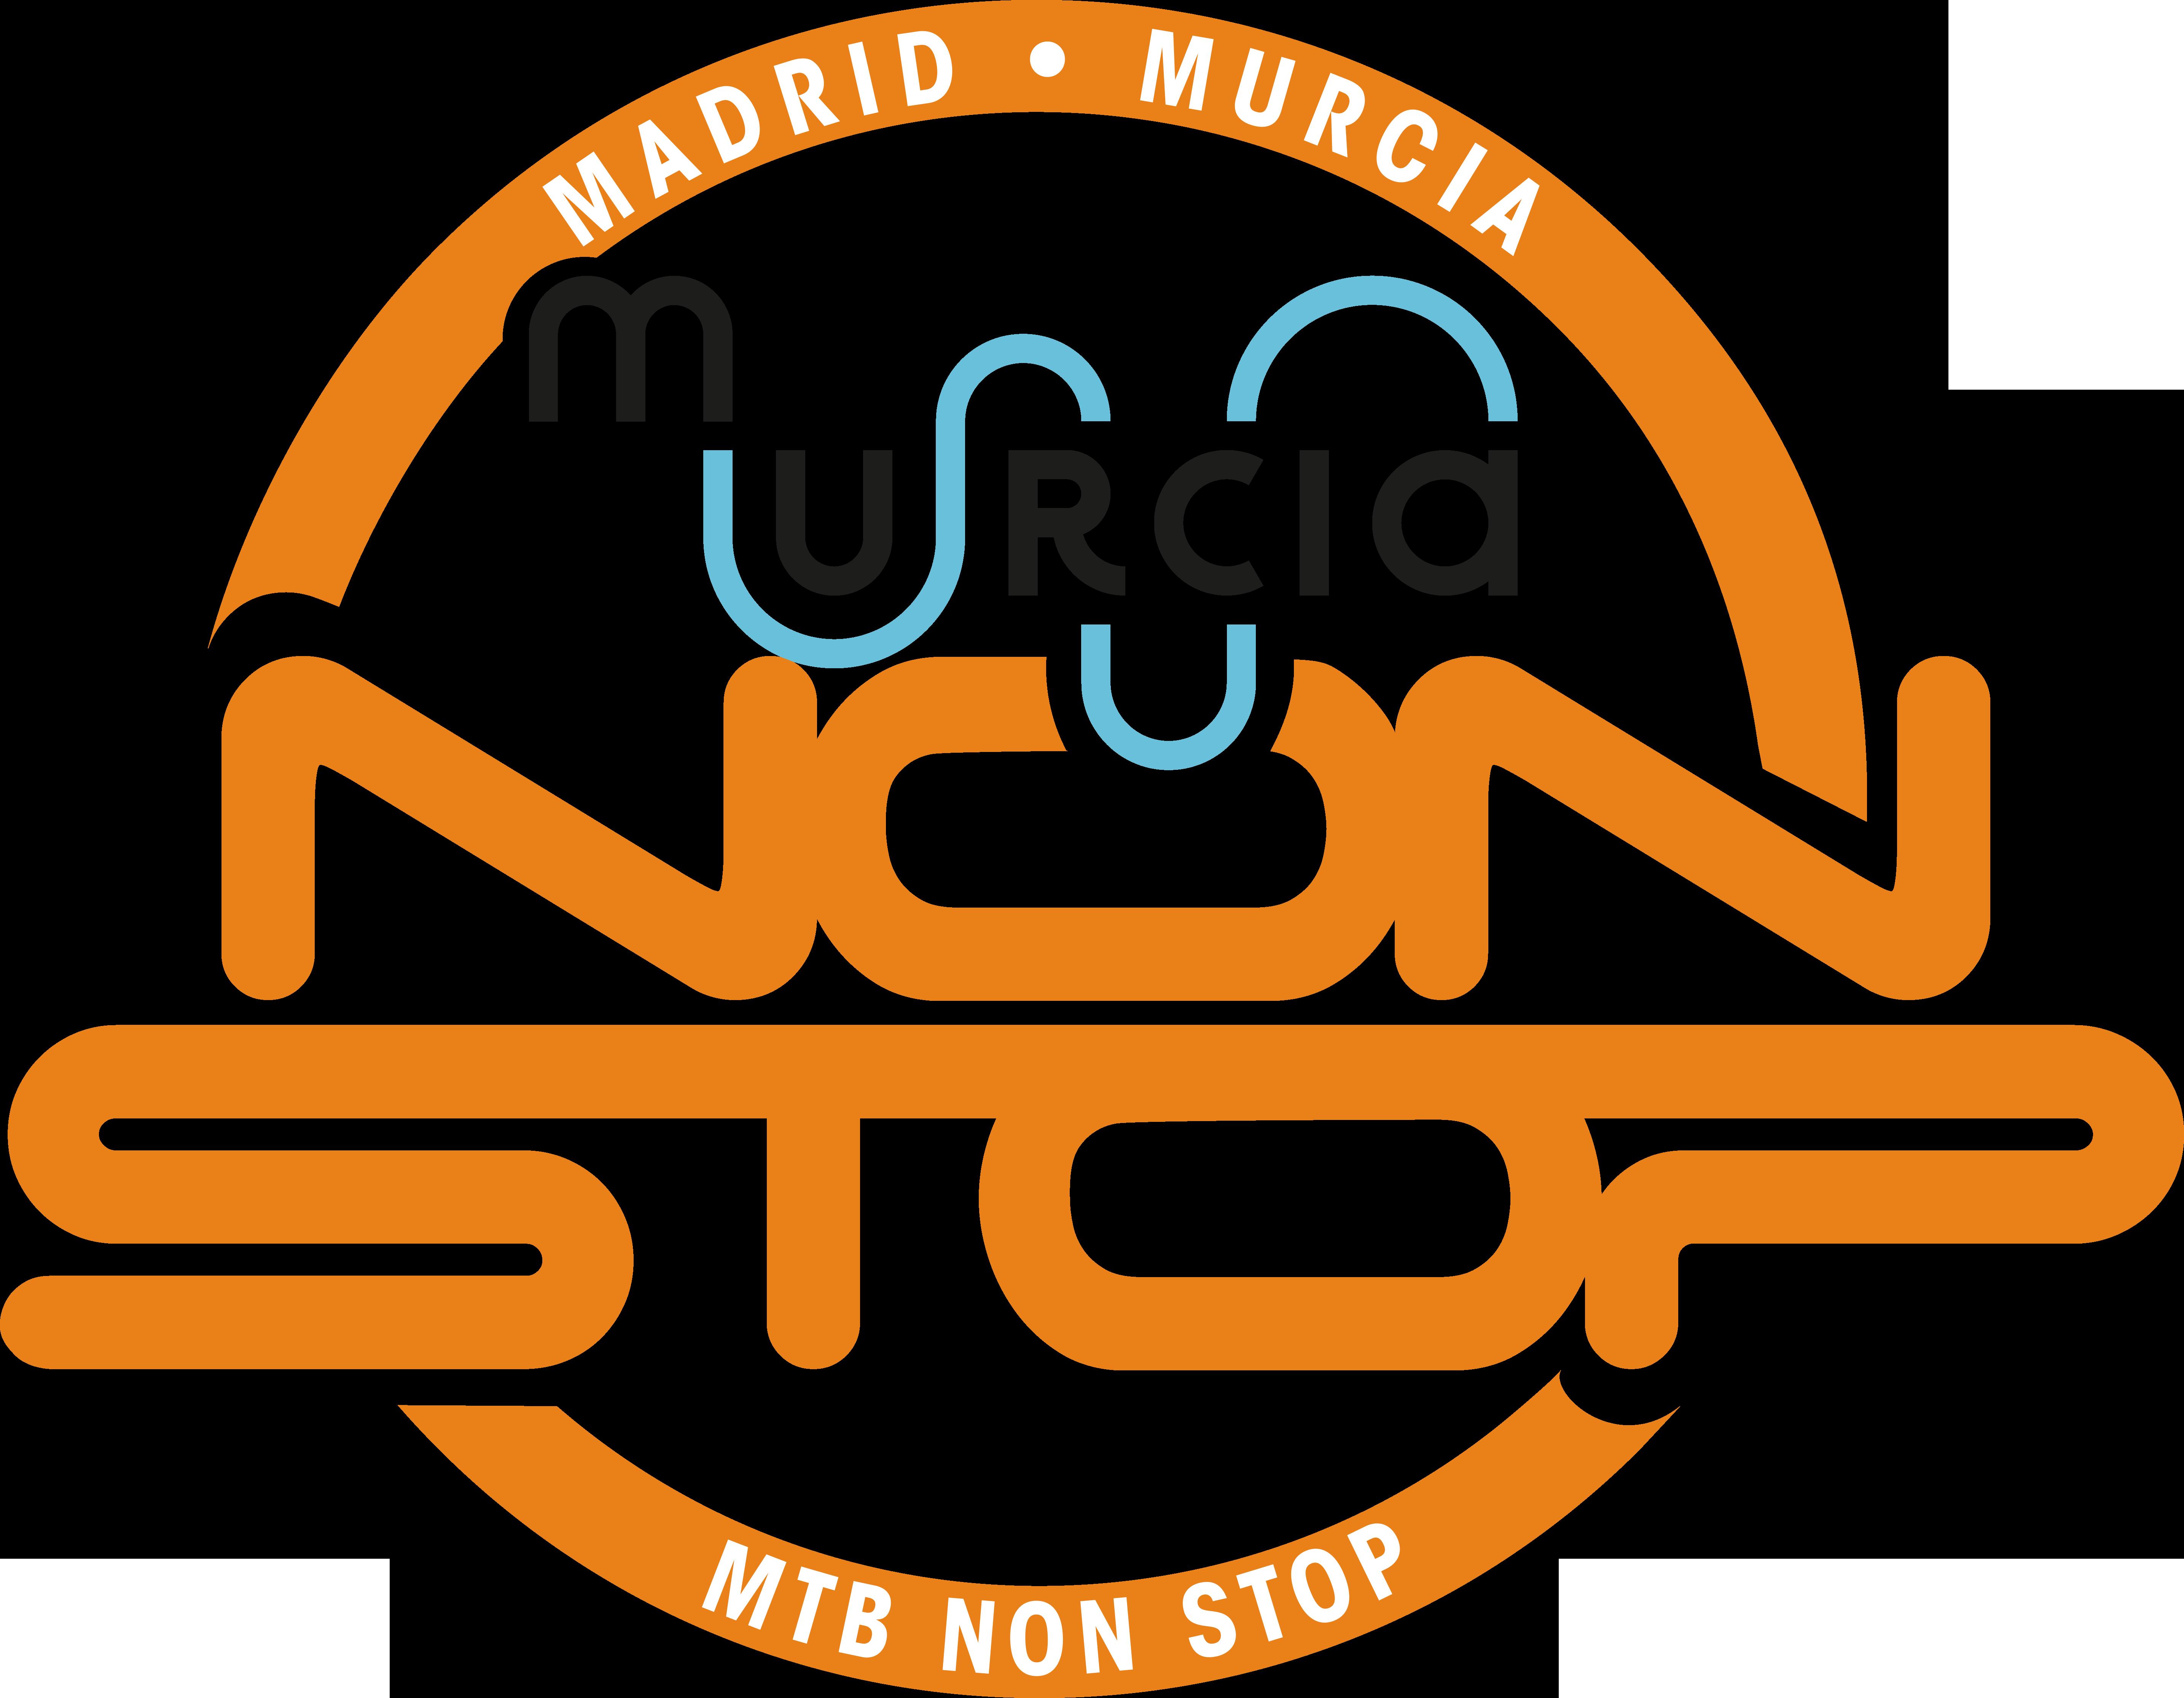 Murcia Non Stop Madrid-Murcia